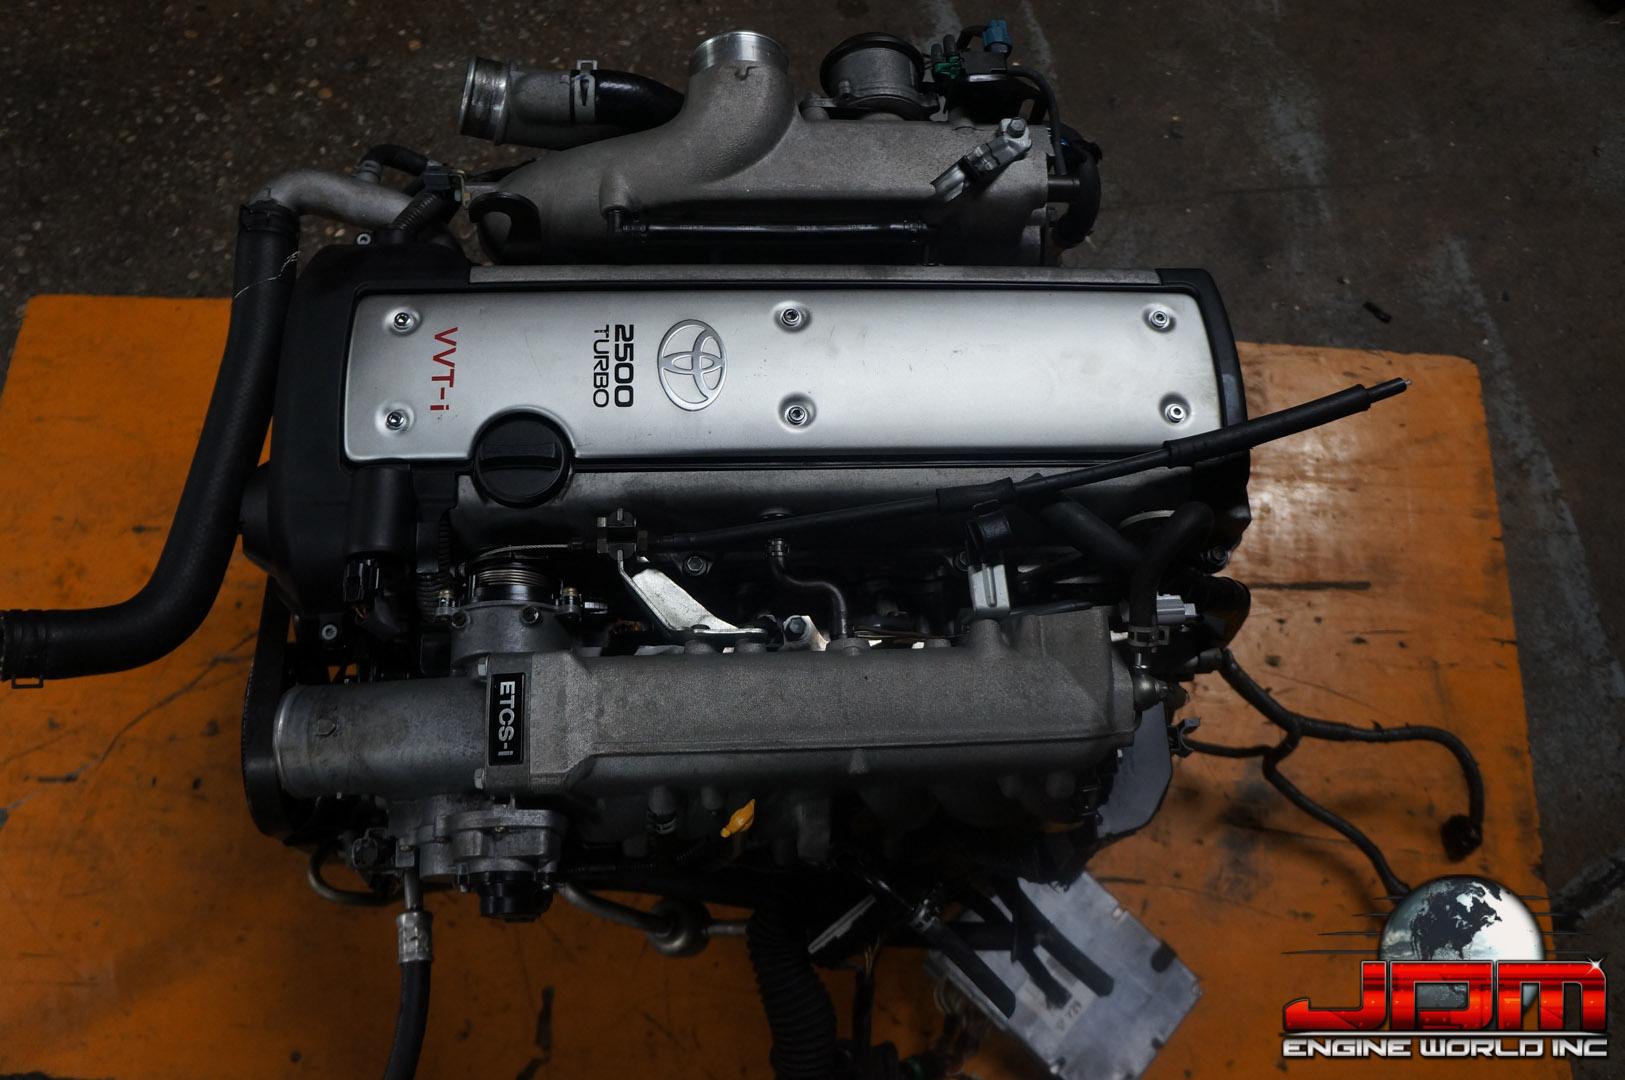 TOYOTA 1JZ-GTE VVTi 2.5L ETCS TURBO FRONT SUMP ENGINE JDM 1JZ